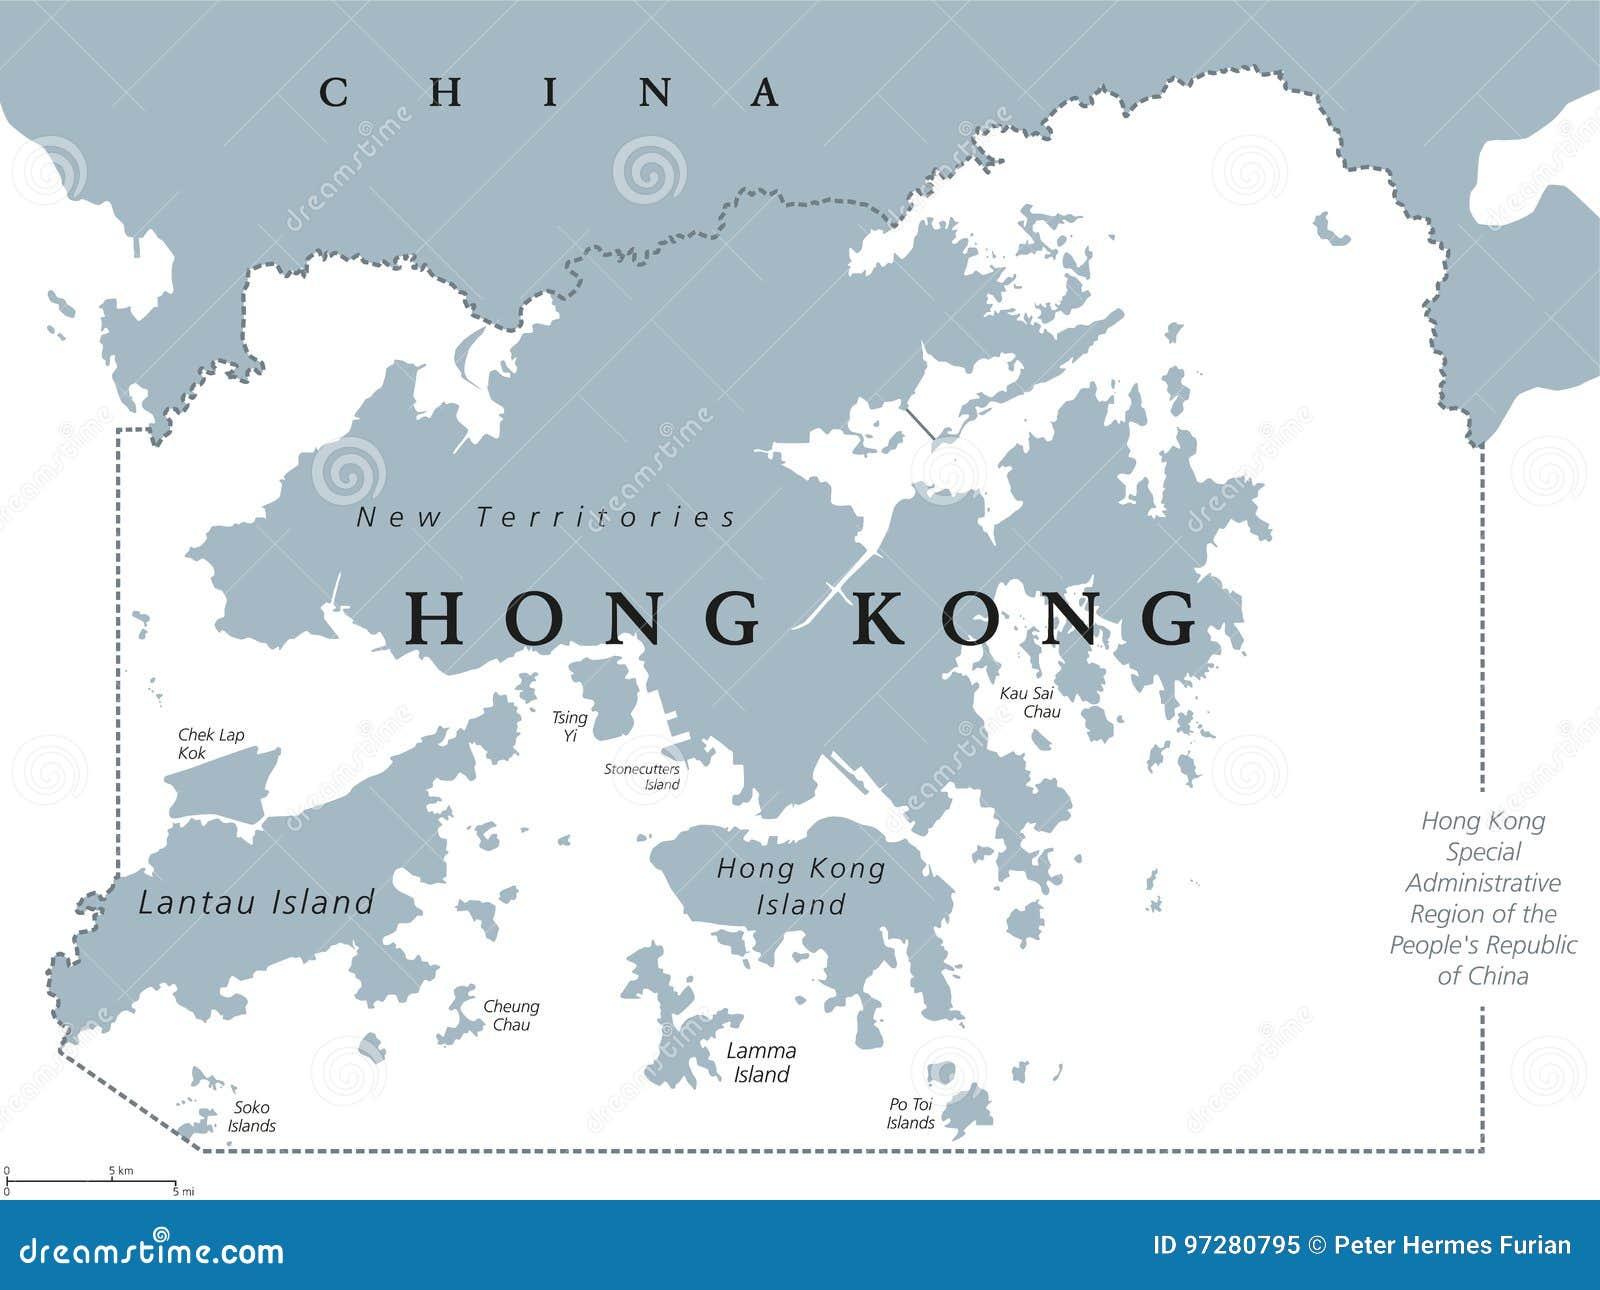 hong kong political map stock vector illustration of financial 97280795. Black Bedroom Furniture Sets. Home Design Ideas